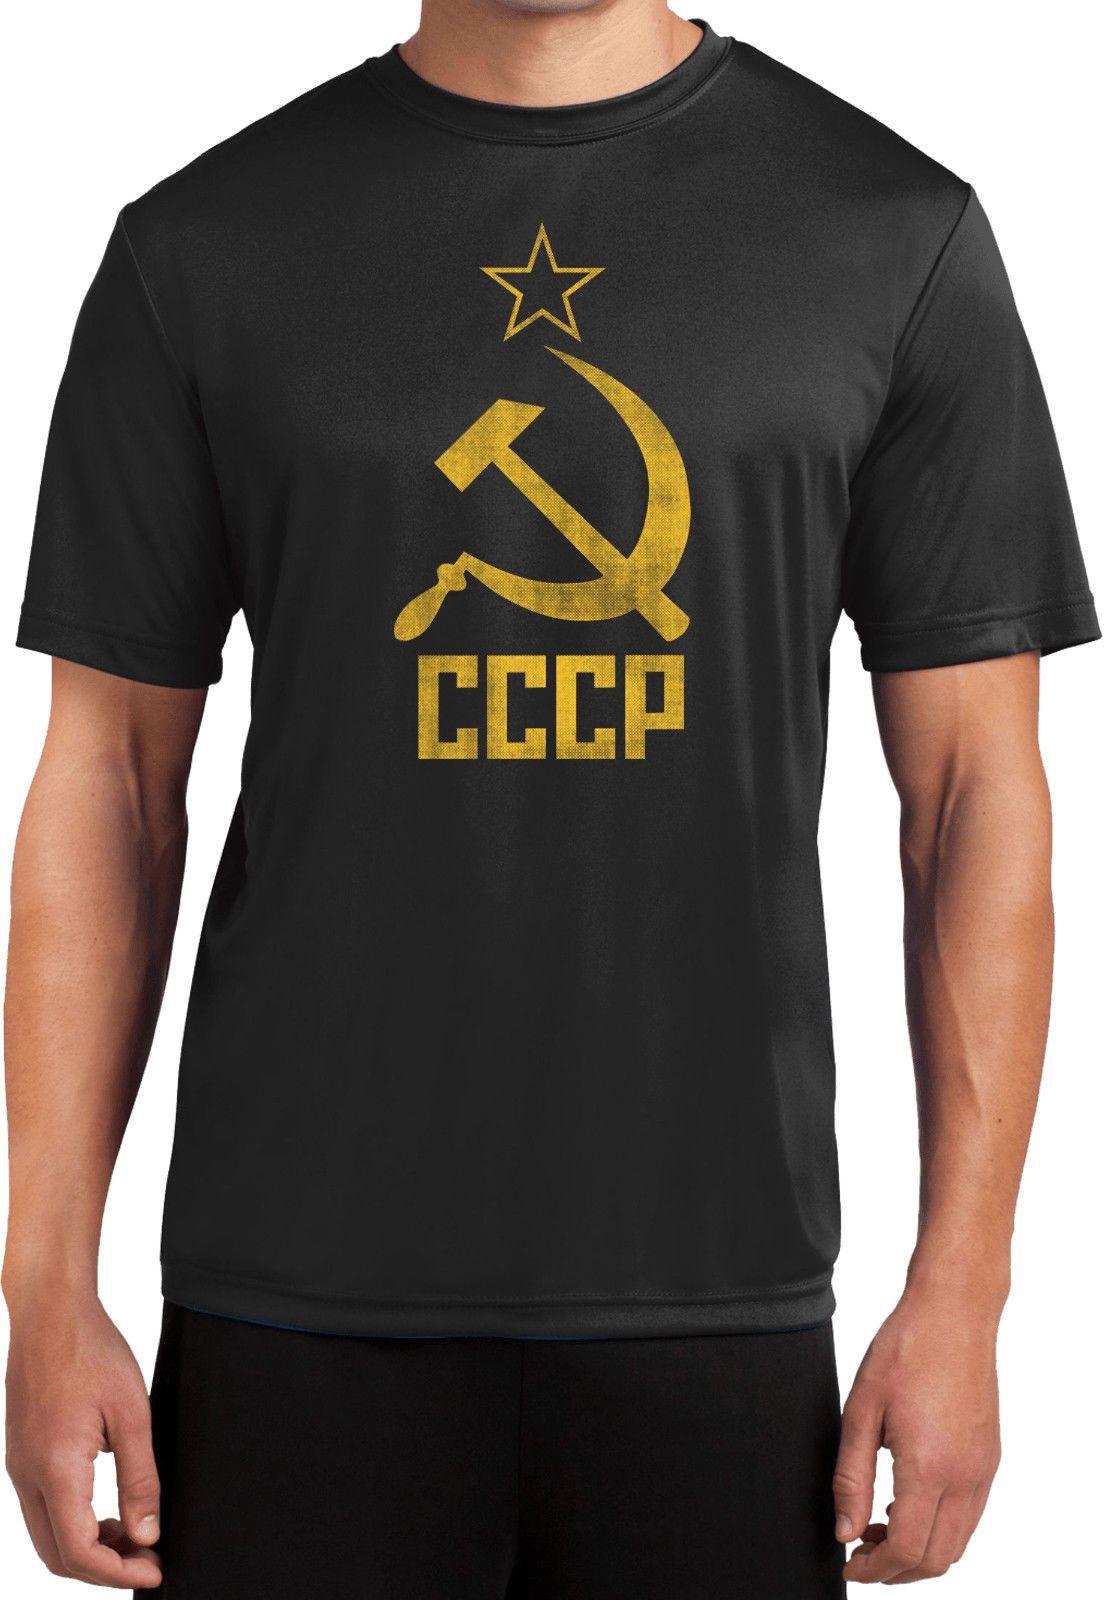 db8279f5395 Buy Cool Shirts Soviet Union T Shirt Distressed Cccp Moisture Wicking Tee T  Shirt Men Boy Factory Wholesale Short Sleeve Fashion Custom Big Funny T  Shirts ...